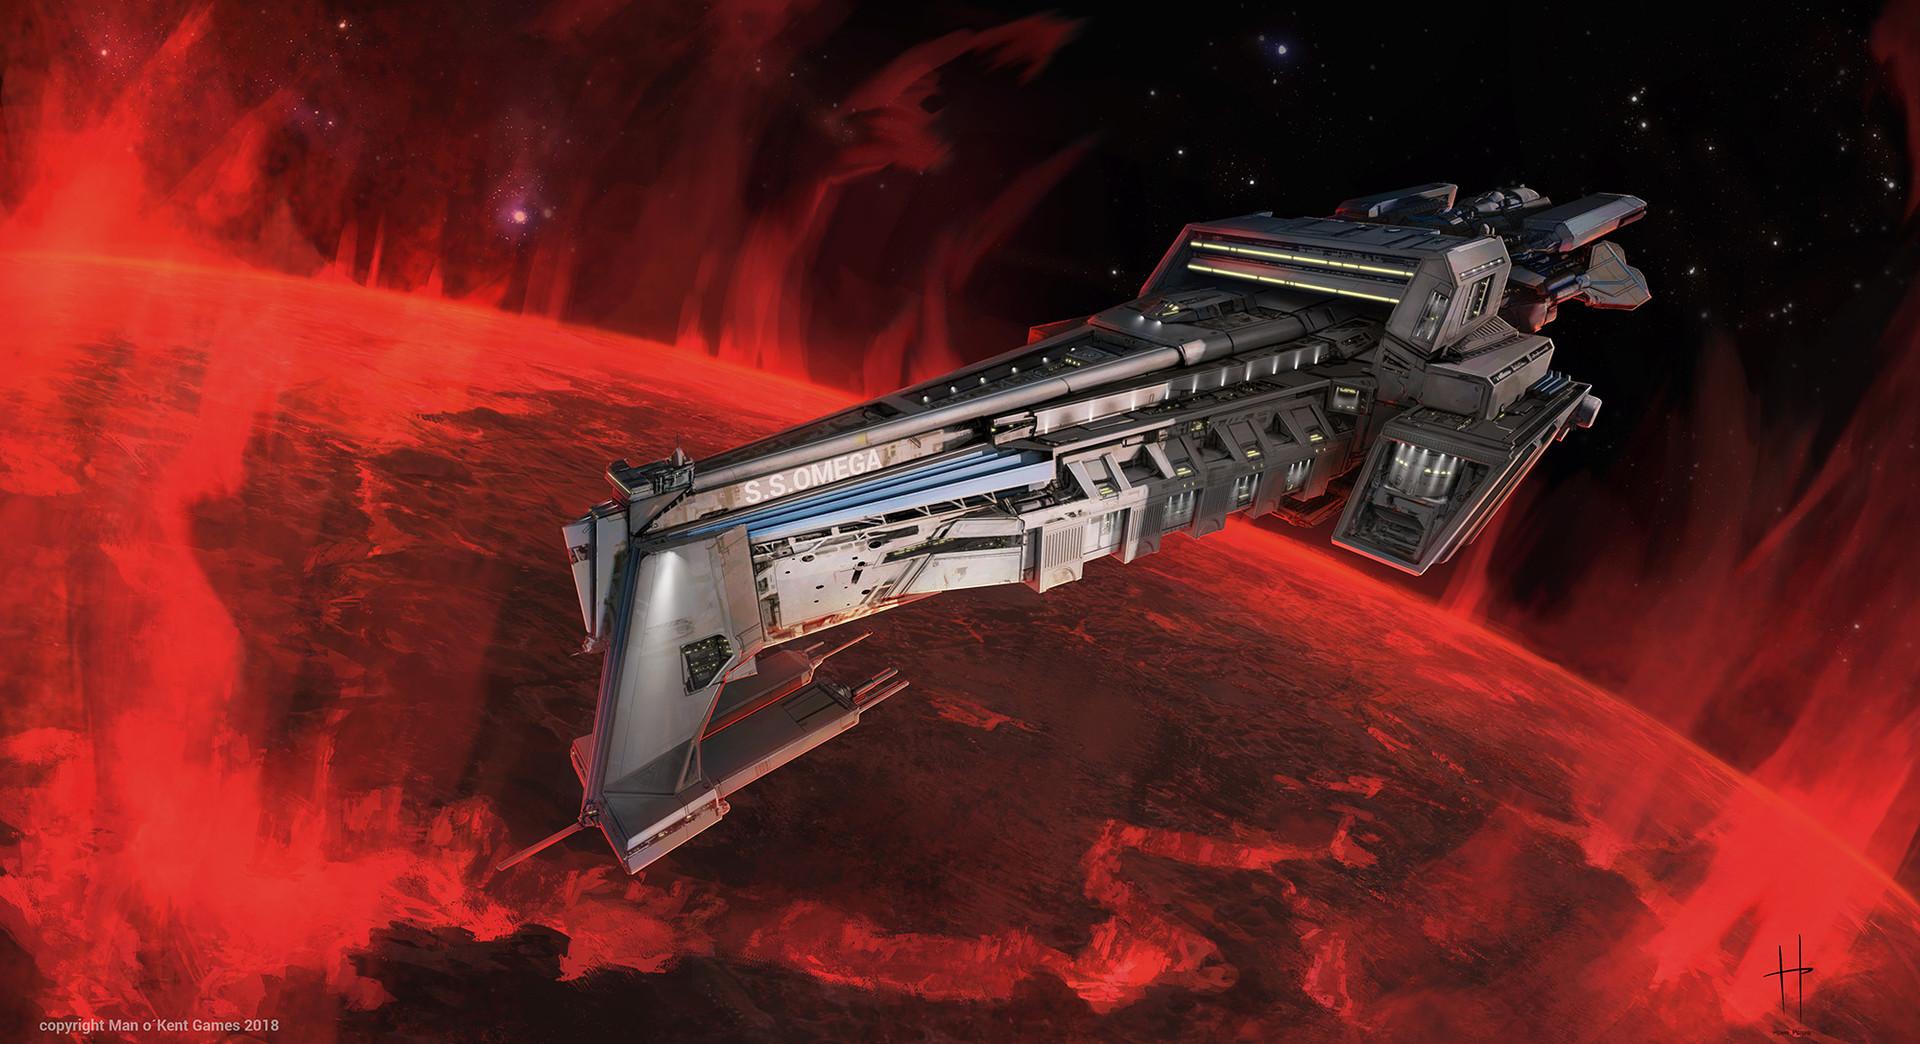 Henry peters spaceship omega